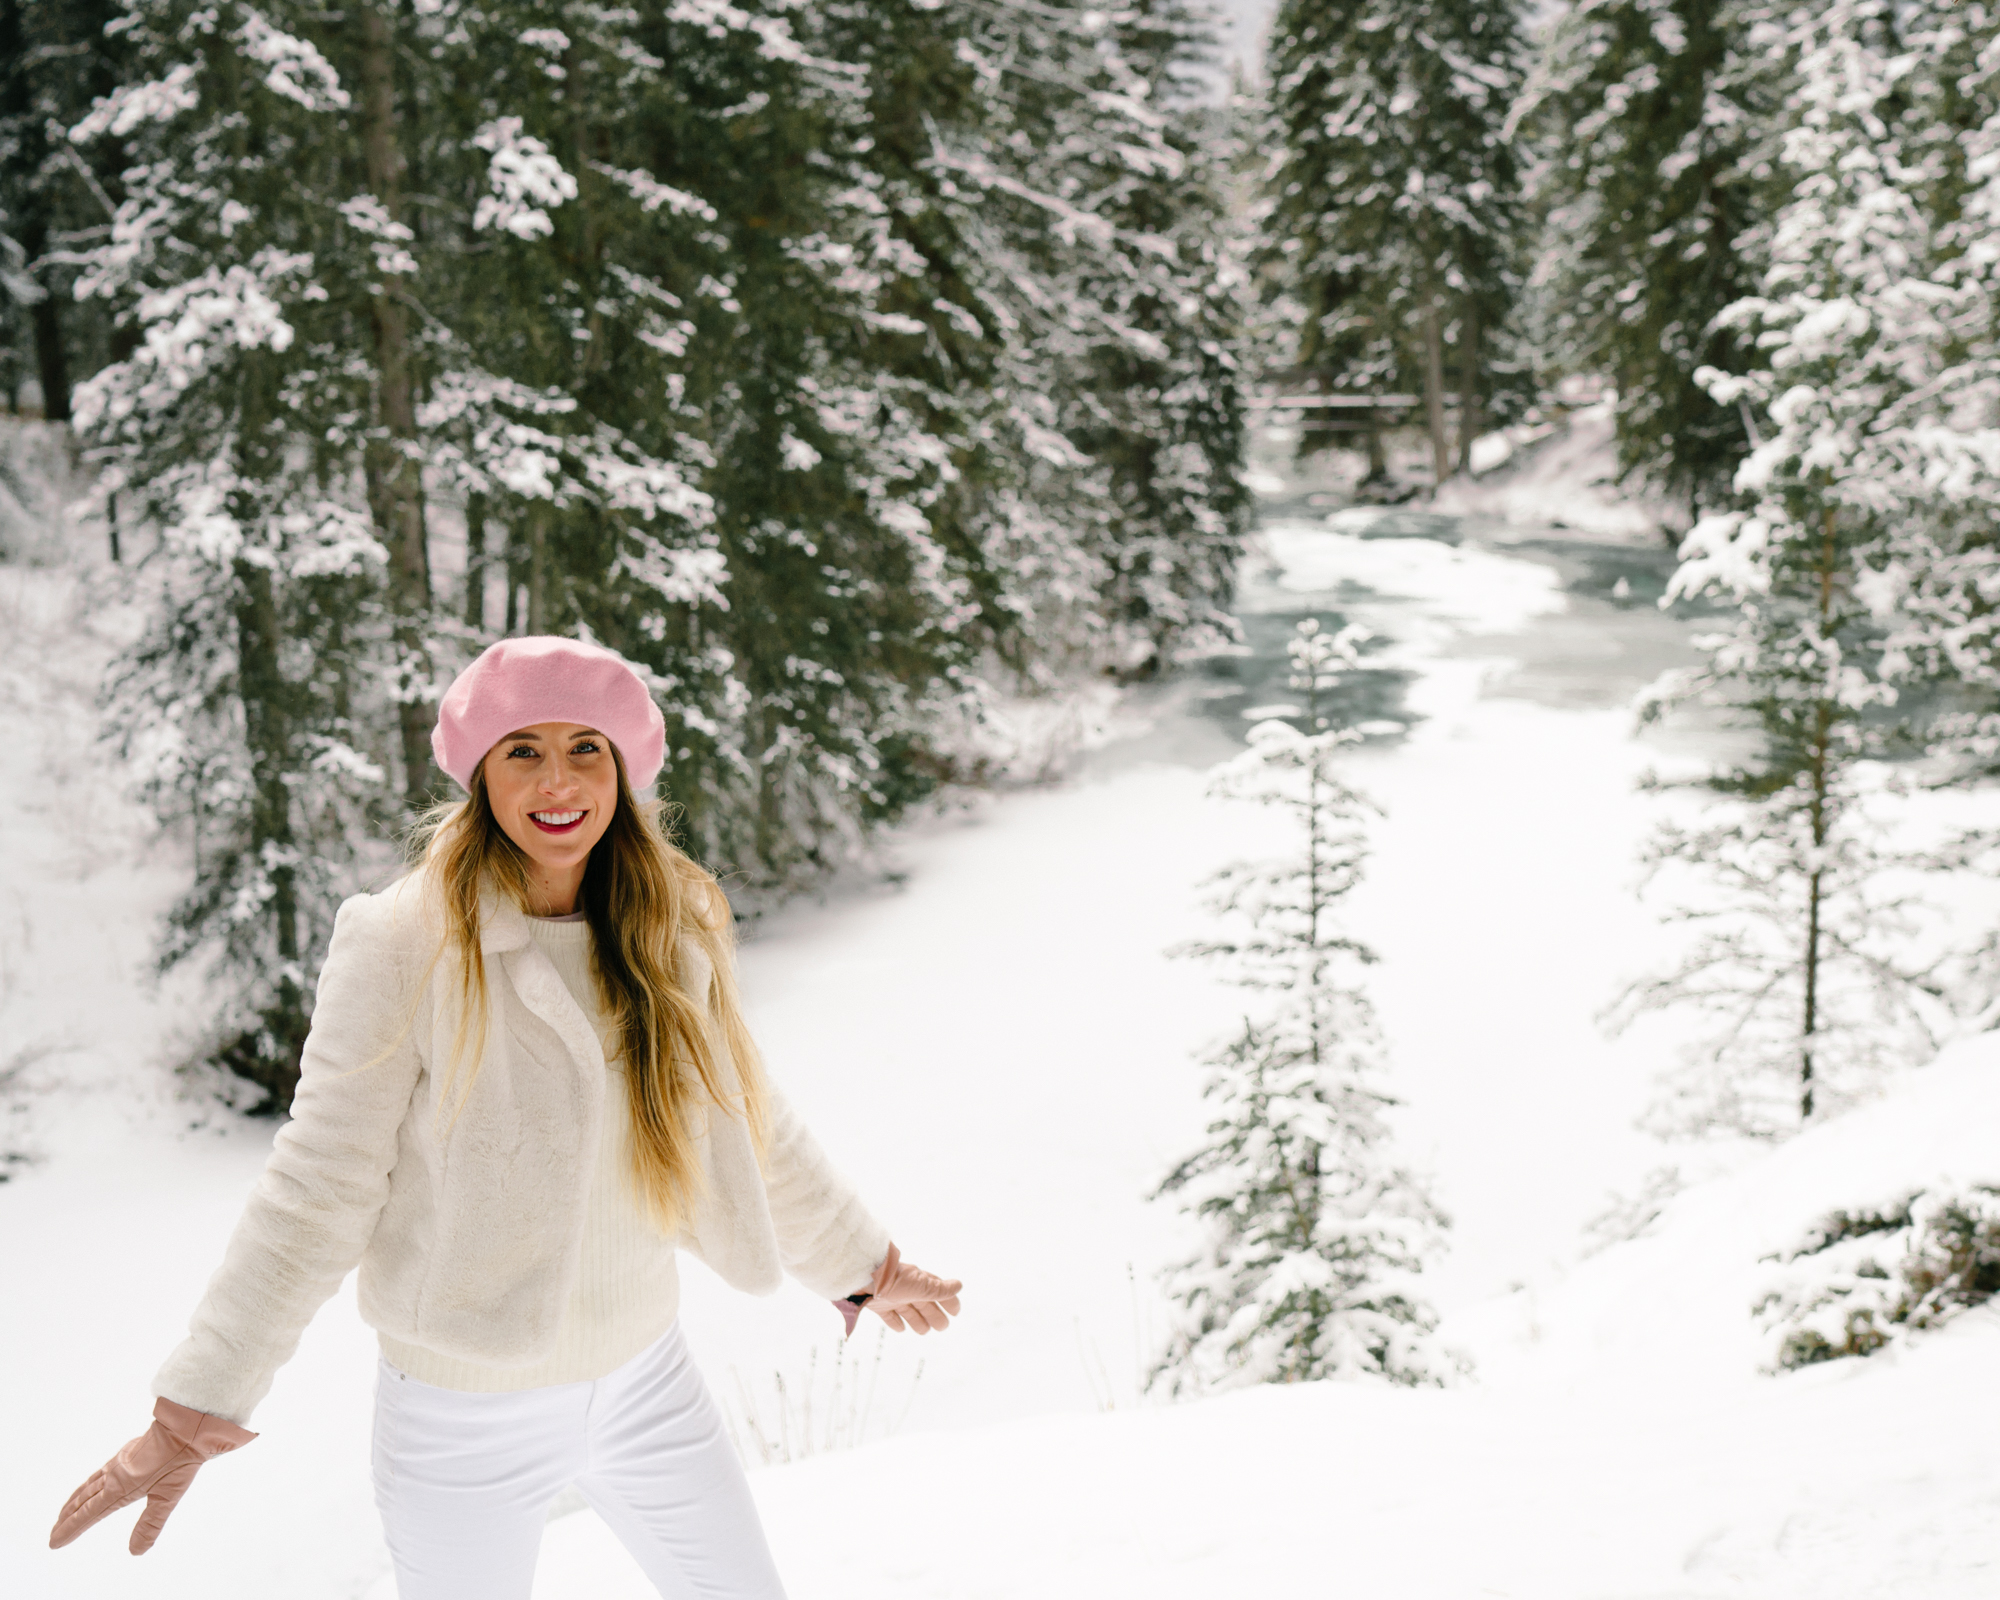 Banff National Park Winter Travel Guide